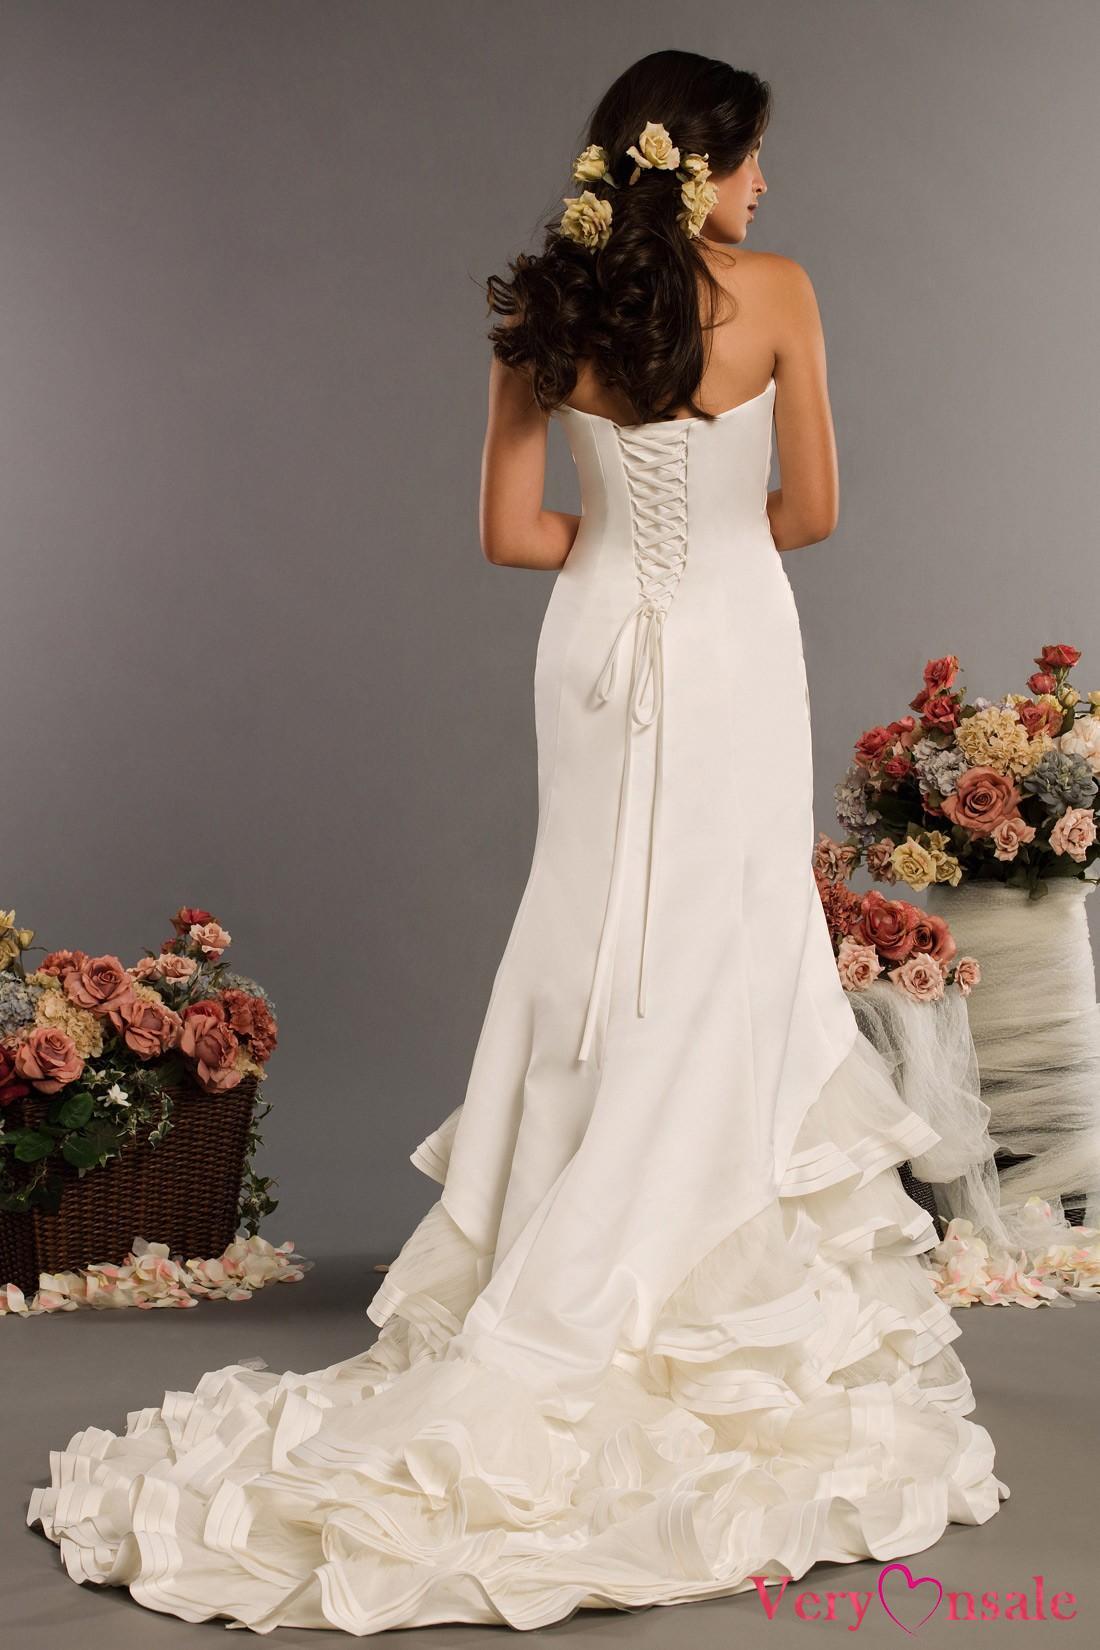 design own wedding dresses photo - 1